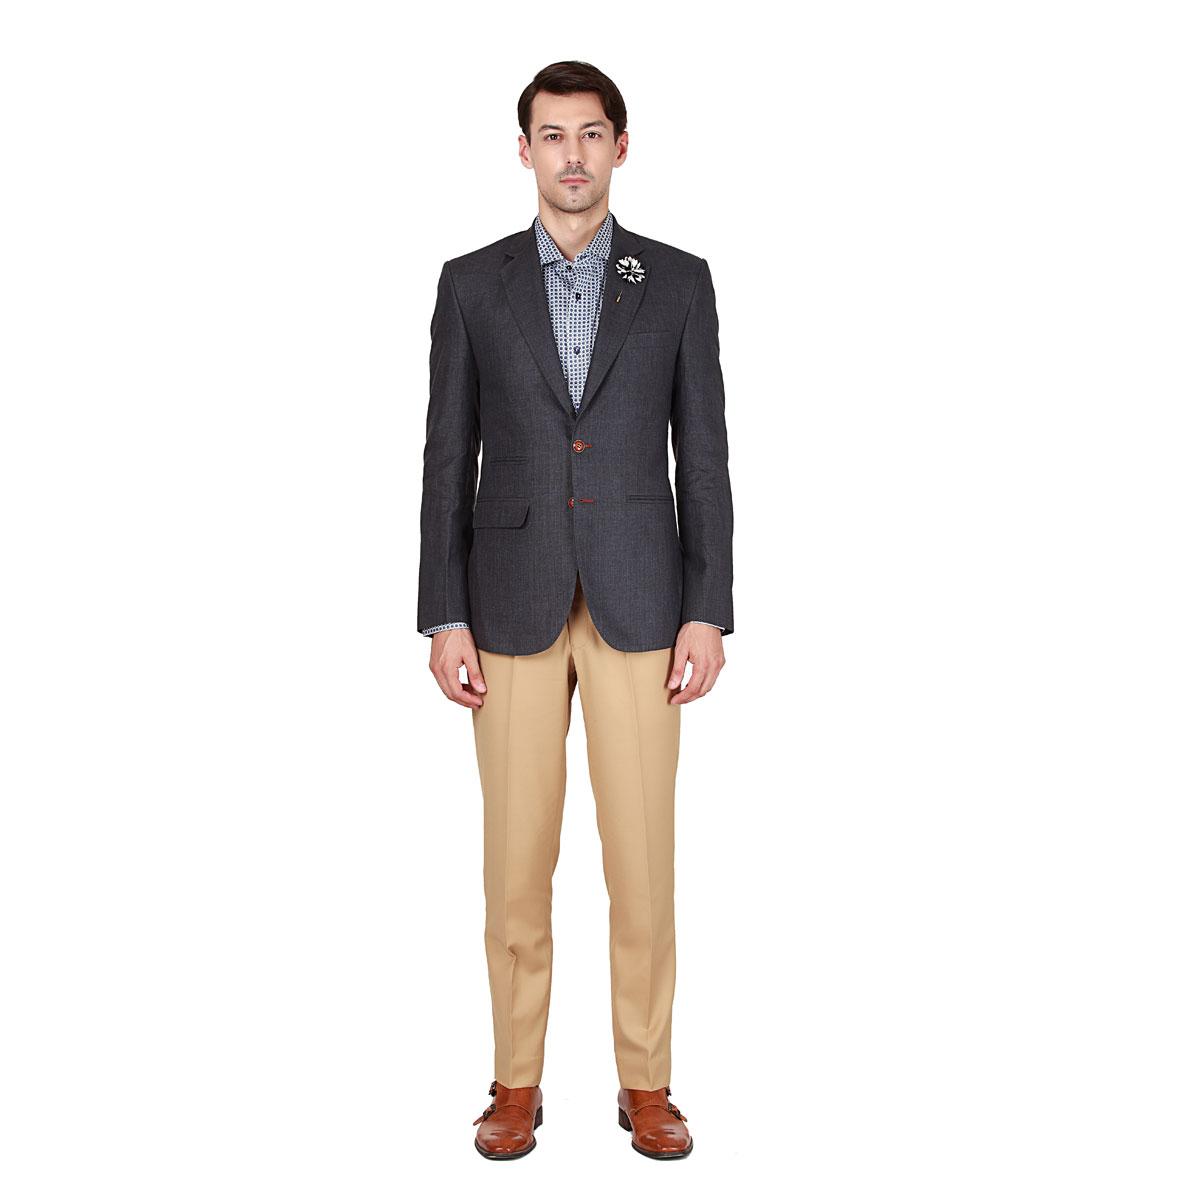 Bespoke clothing online